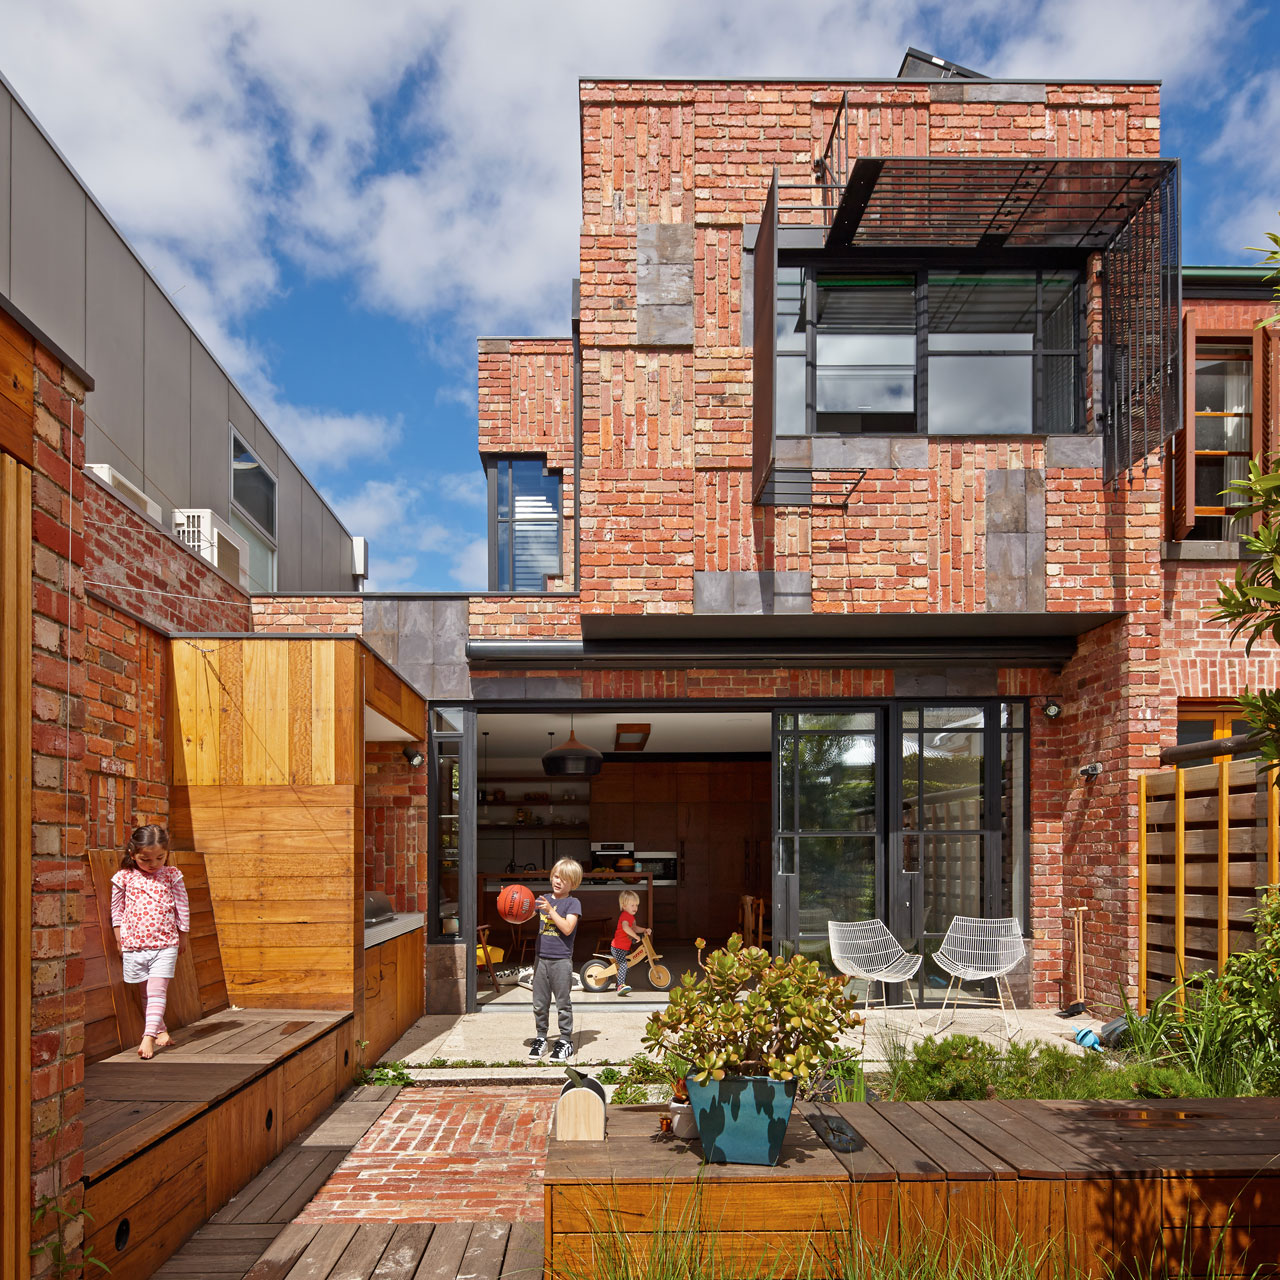 Best Kitchen Gallery: Victorian Home Gets A Modern Renovation Design Milk of Modern Home Renovation  on rachelxblog.com